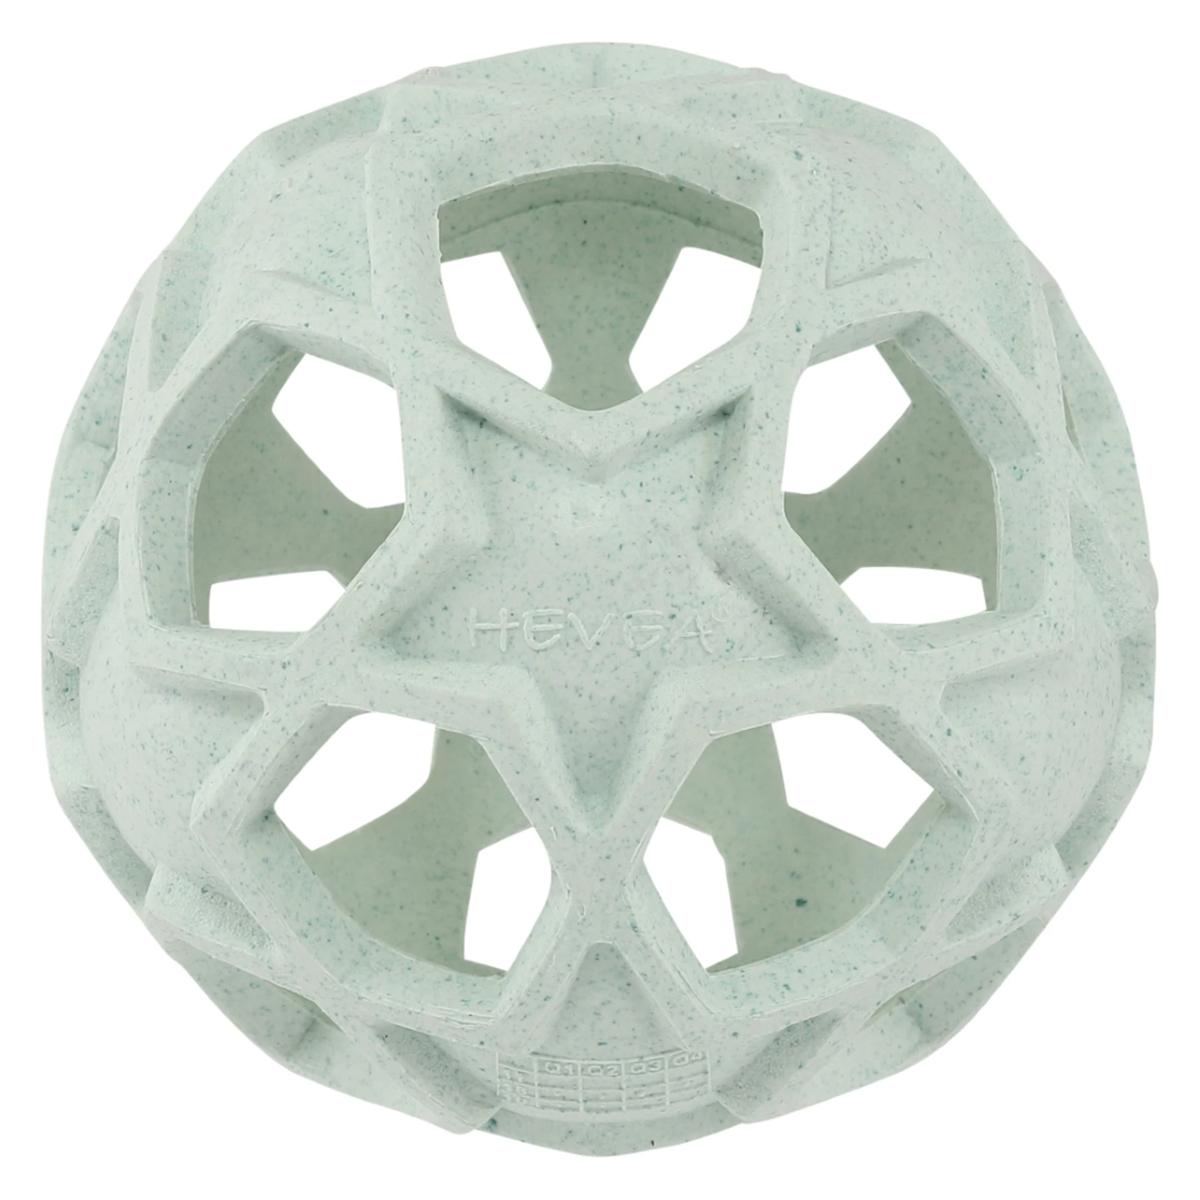 Dentition Star Ball Caoutchouc Naturel - Mint Star Ball Caoutchouc Naturel - Mint